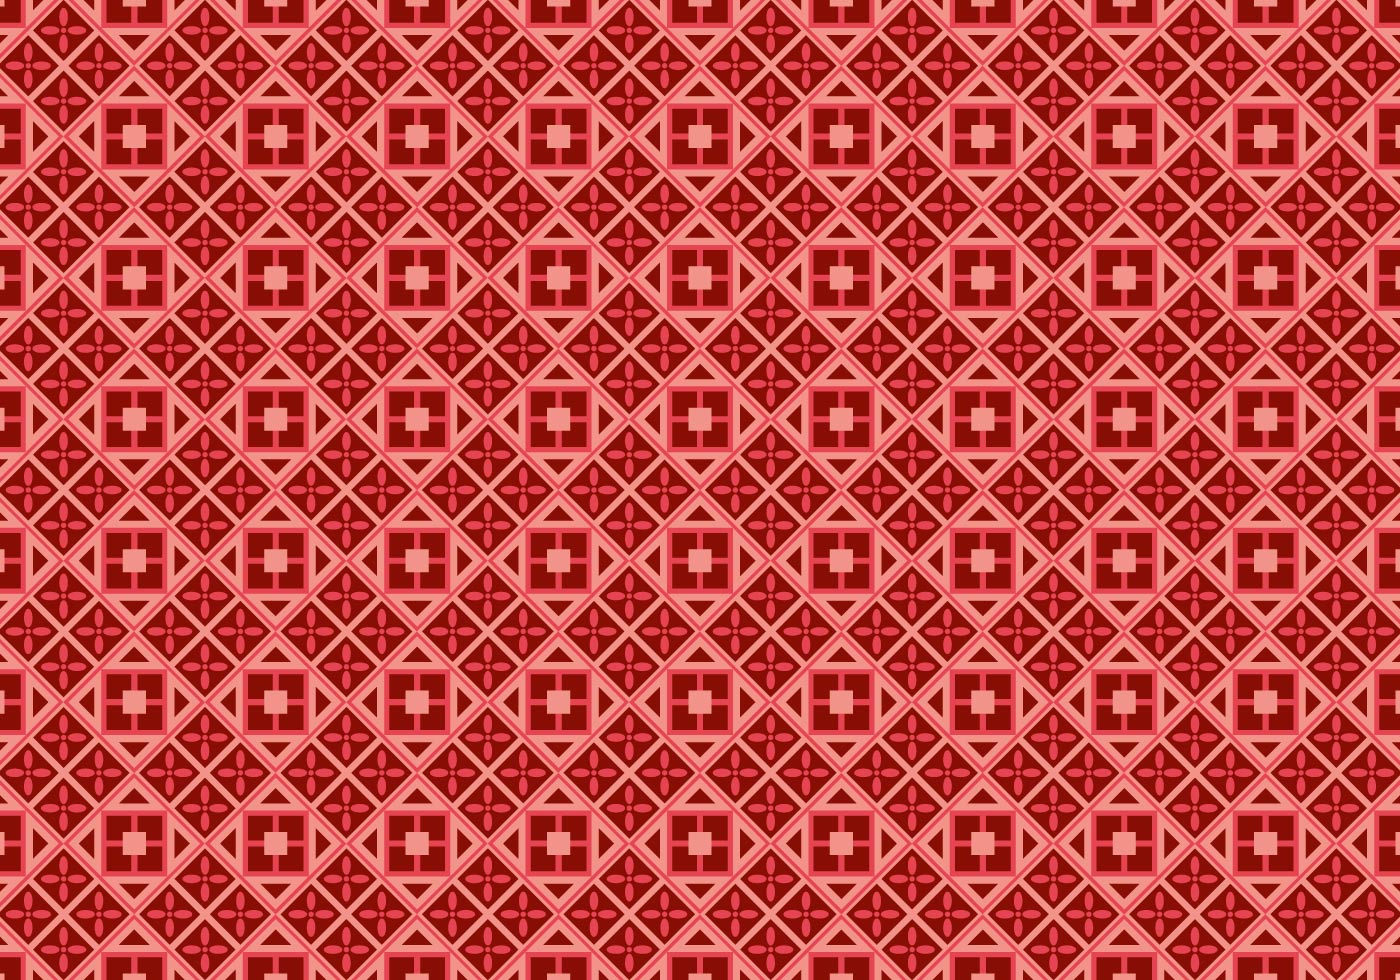 batik background vectors - photo #2